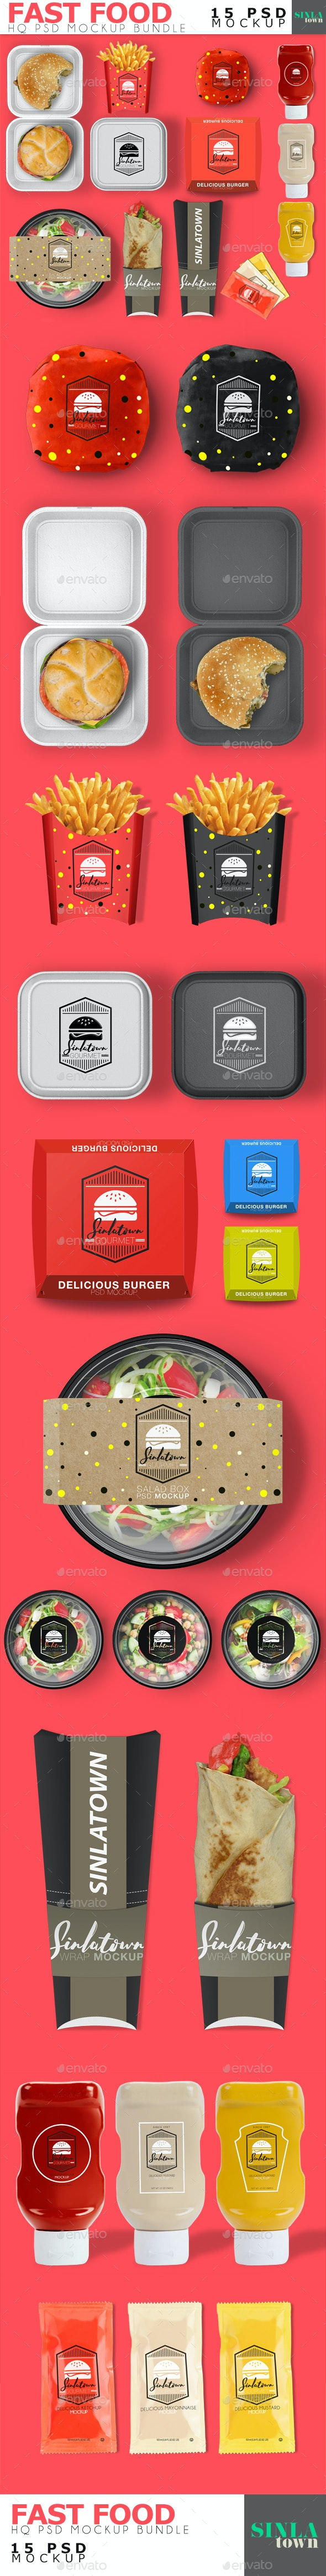 Fast Food Product Mockup Bundle - Product Mock-Ups Graphics